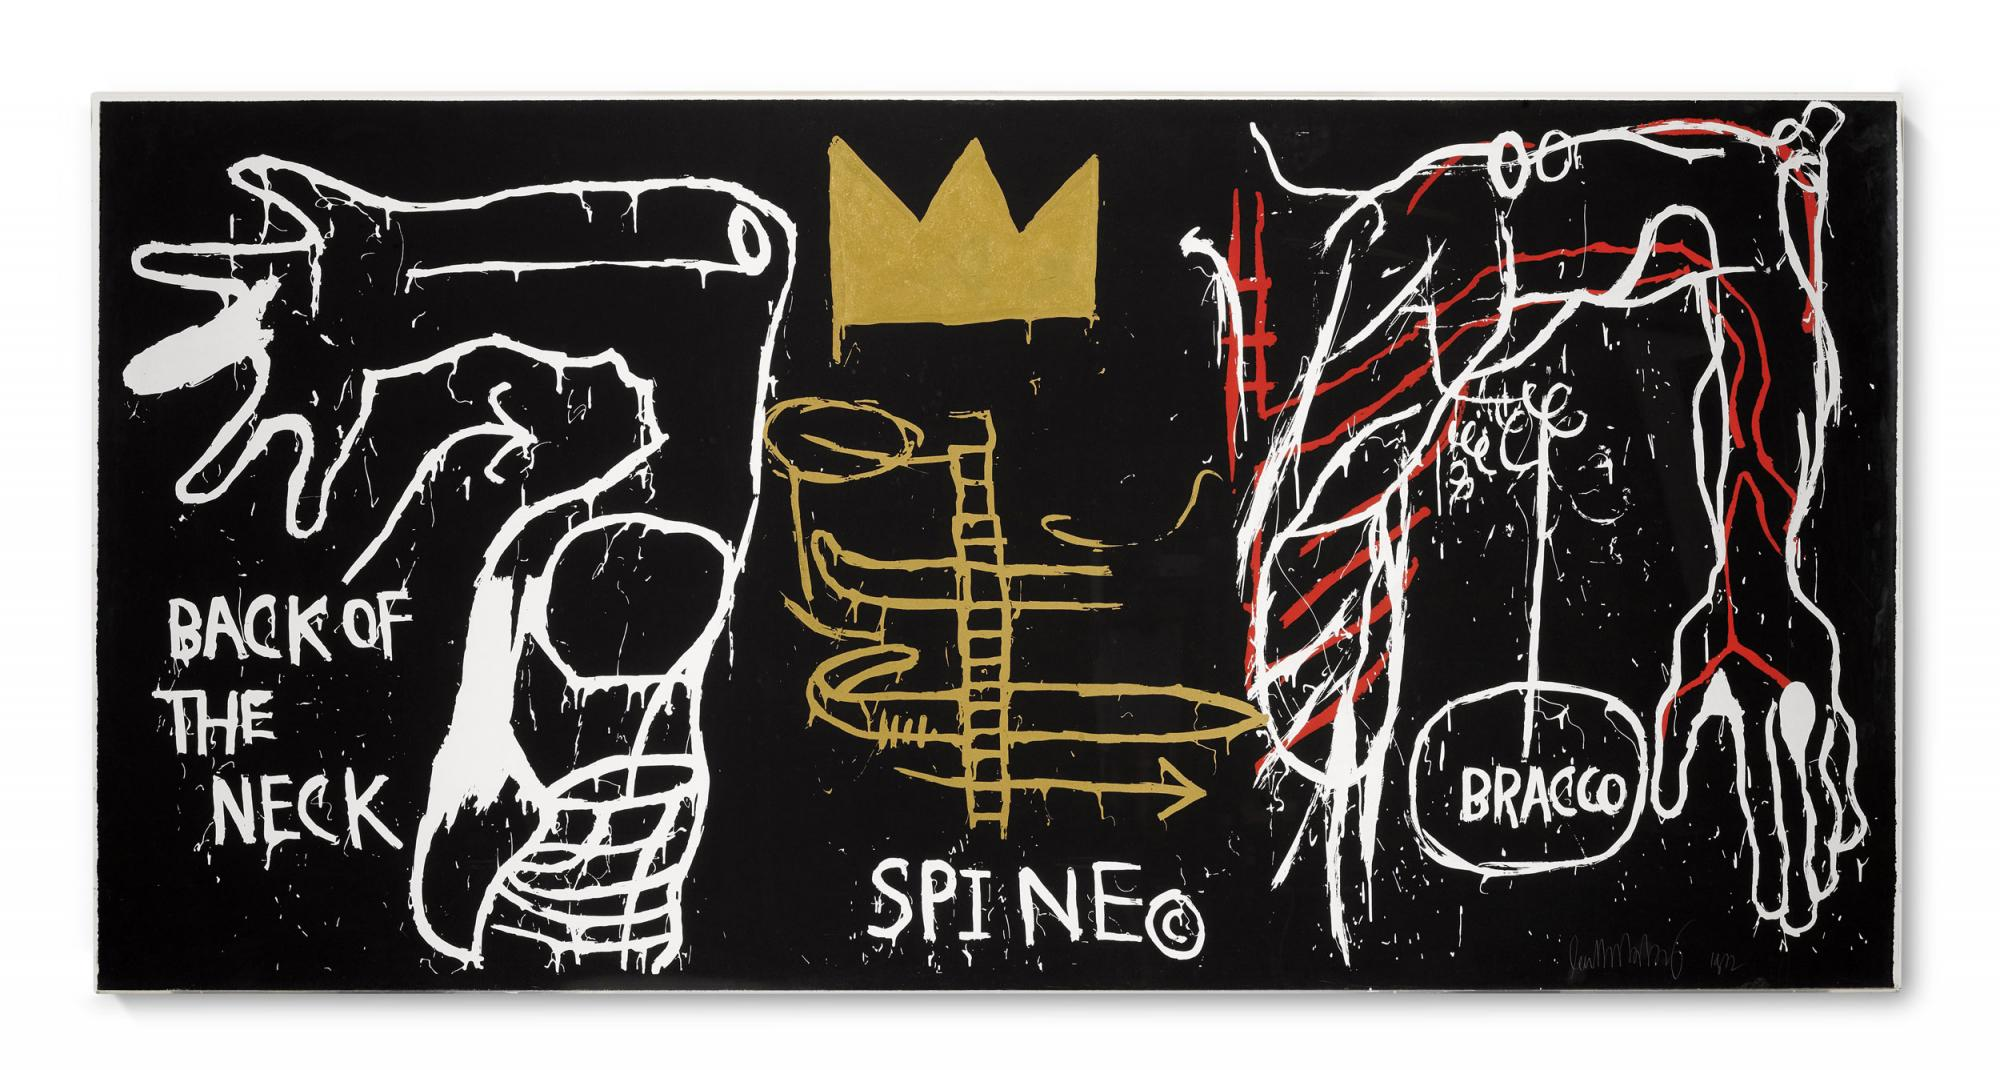 Lot-132,-Jean-Michel-Basquiat,-Back-of-the-Neck,-1983,-est.jpg